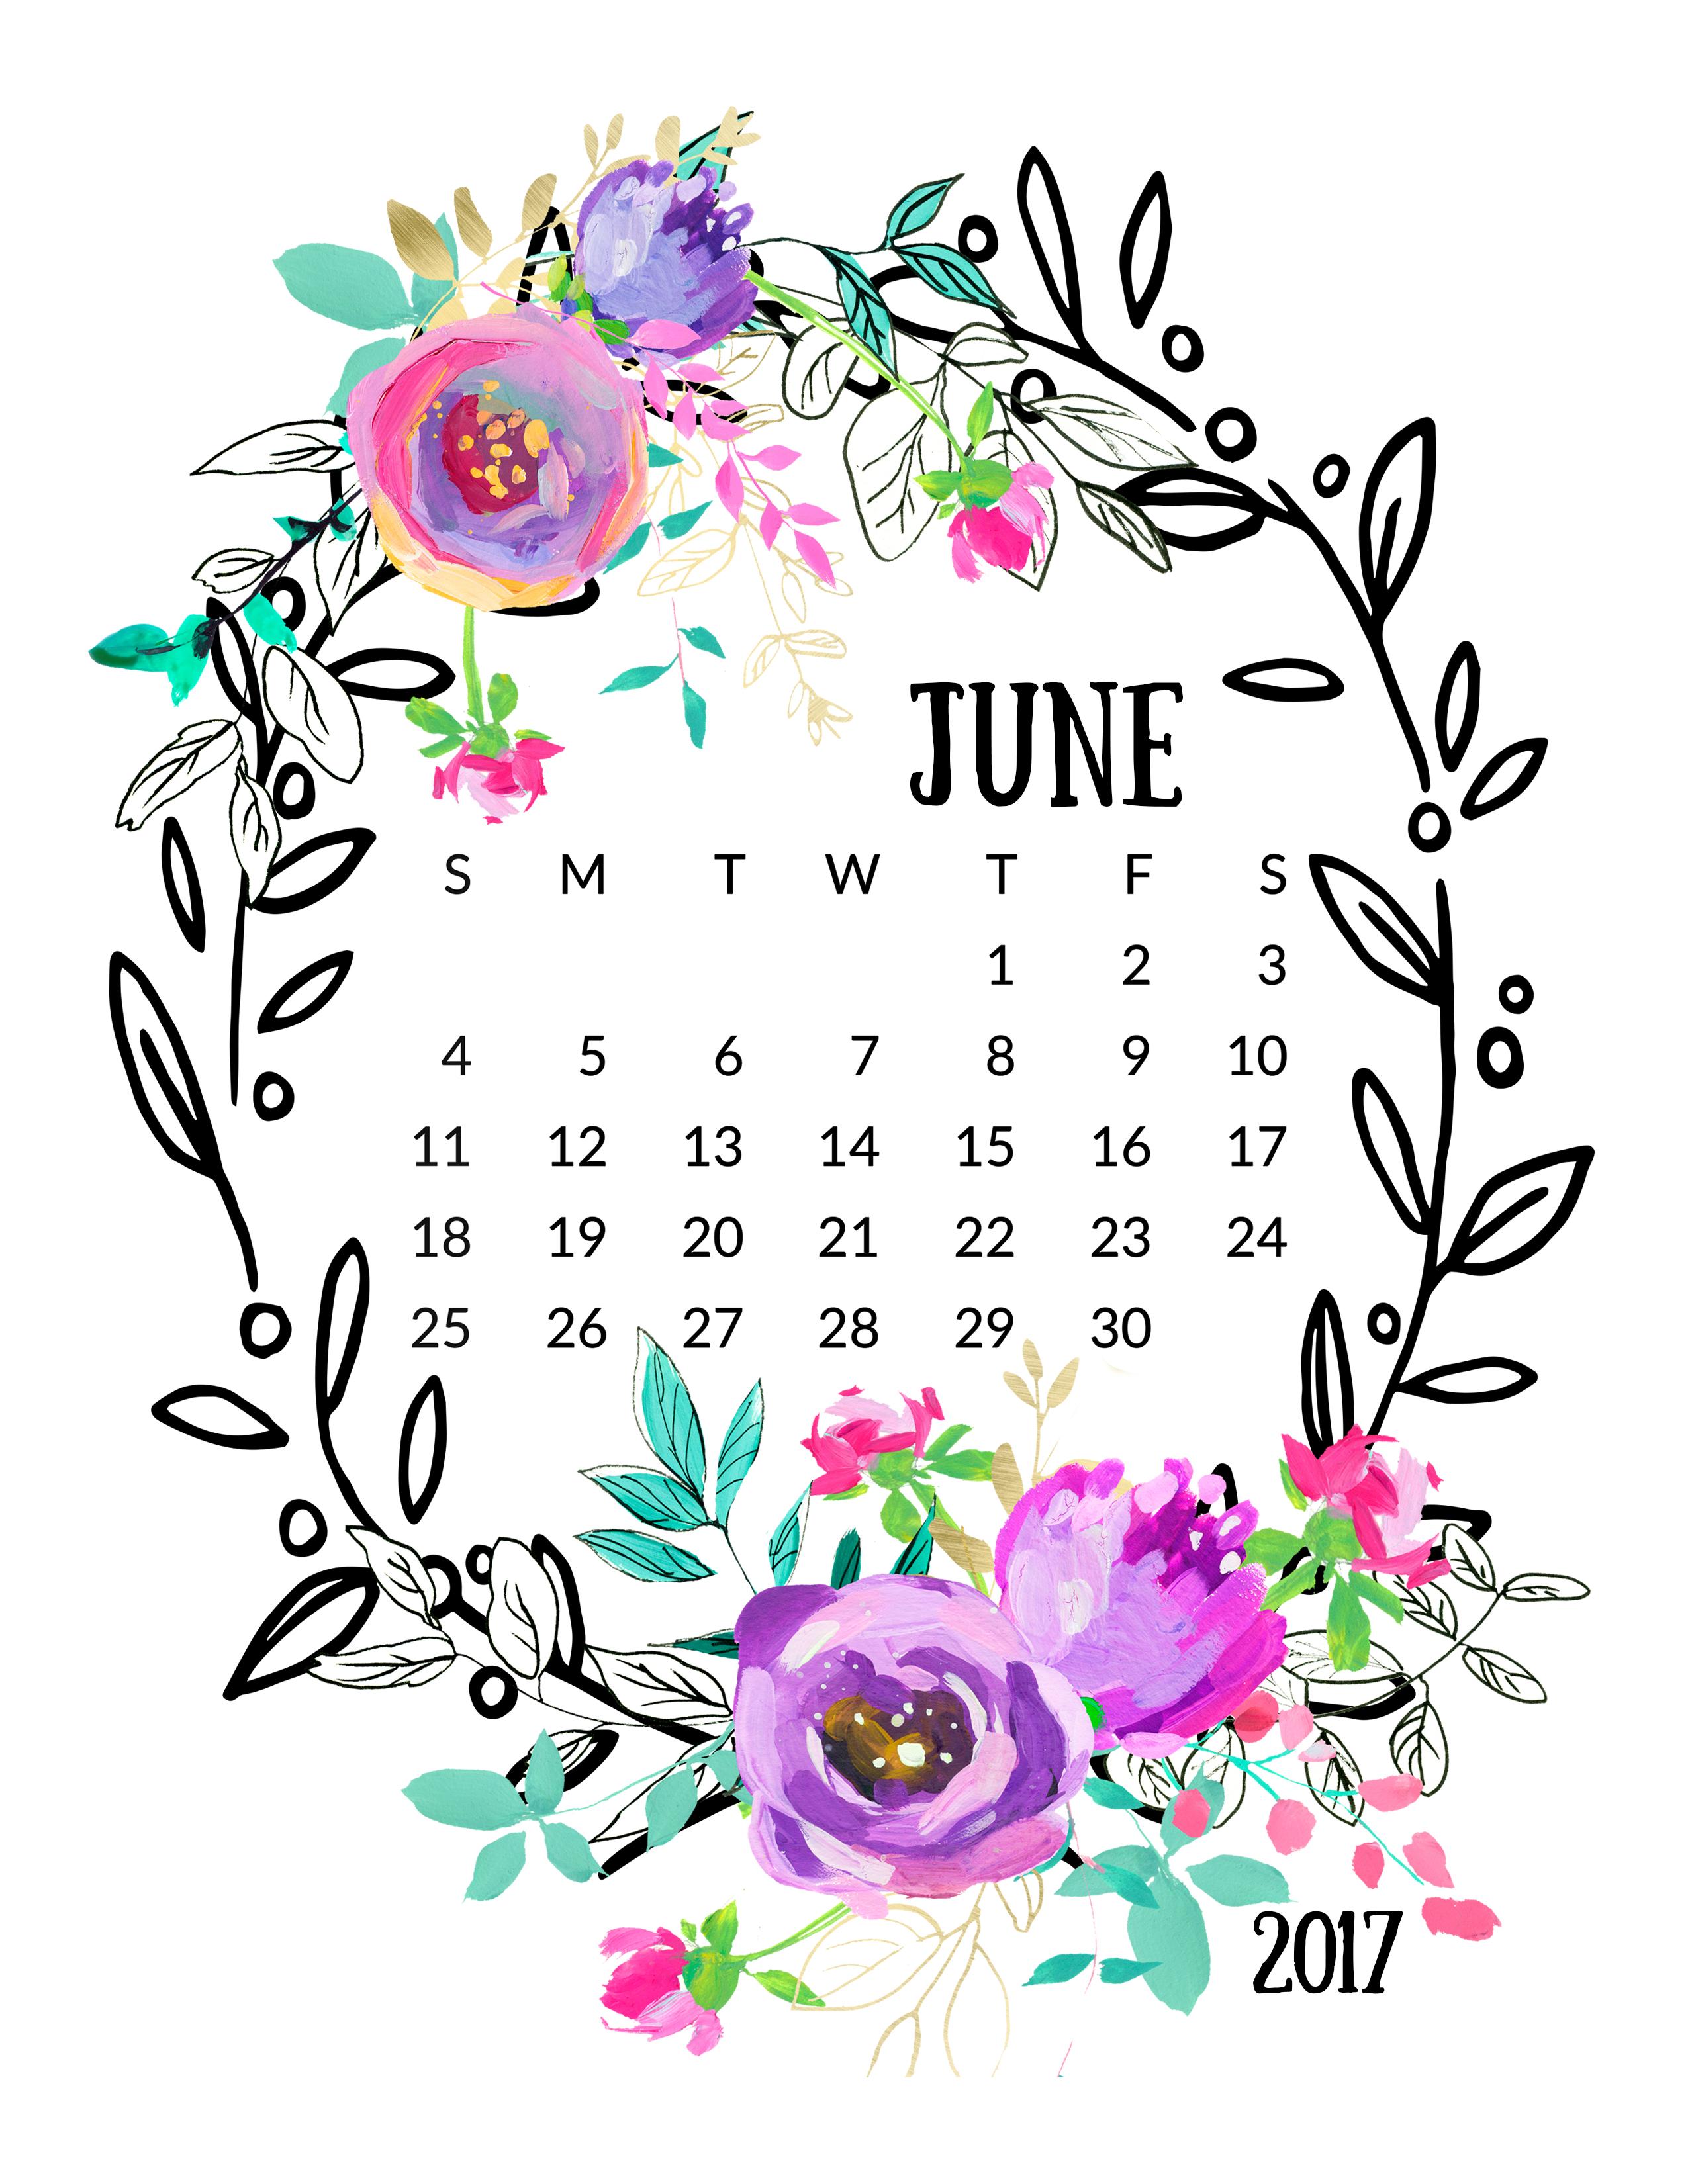 Calendar clipart april 2017. Mint and purple free